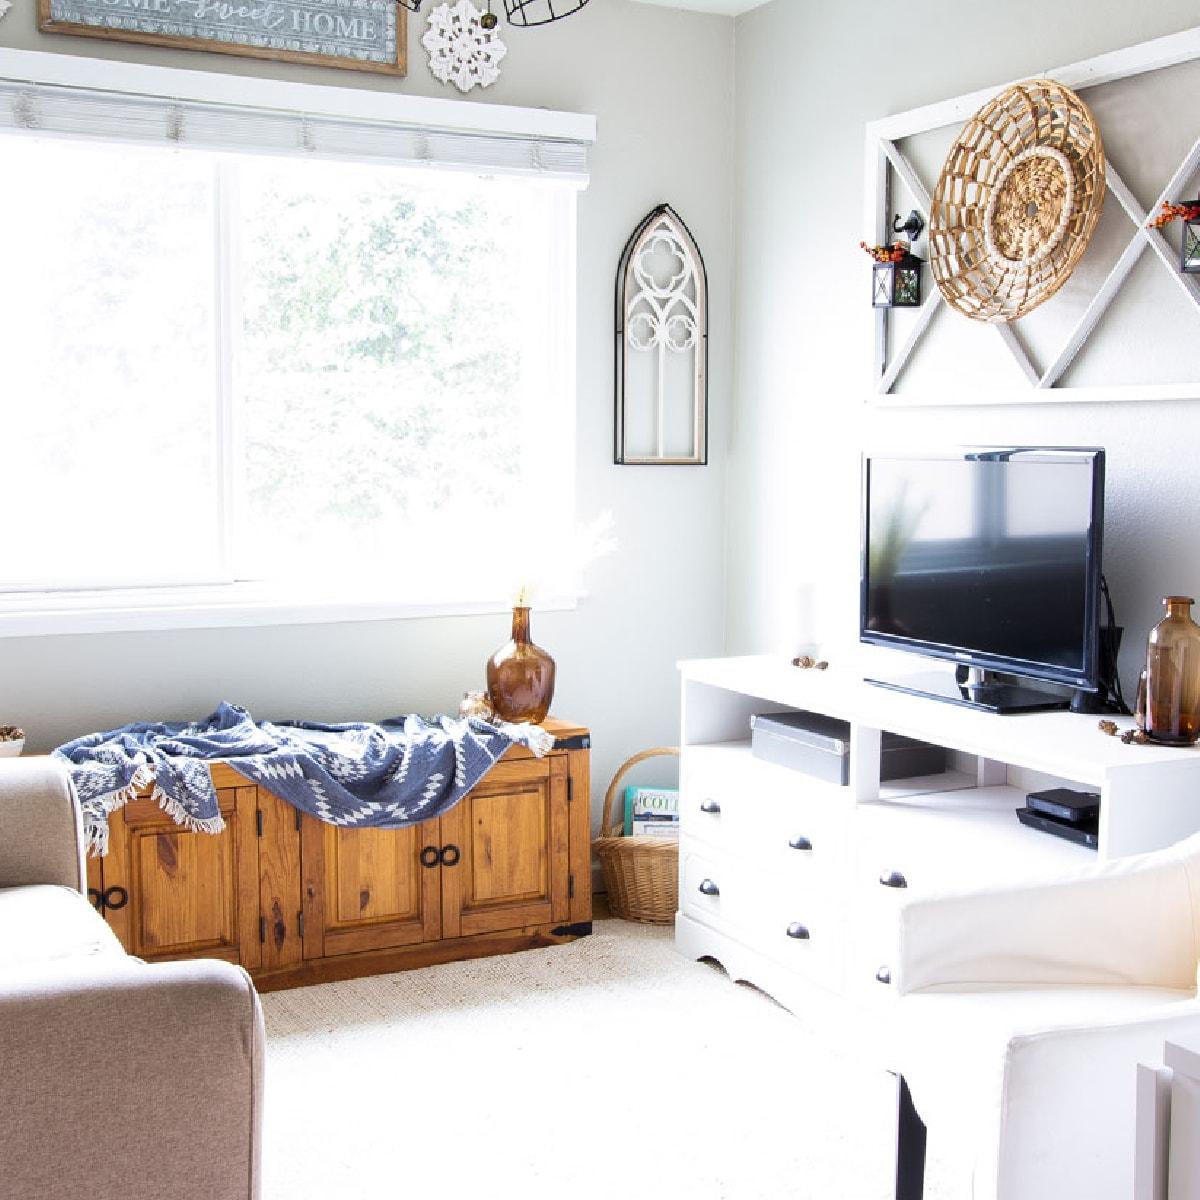 Easy Fall Decor Ideas for a Small Home